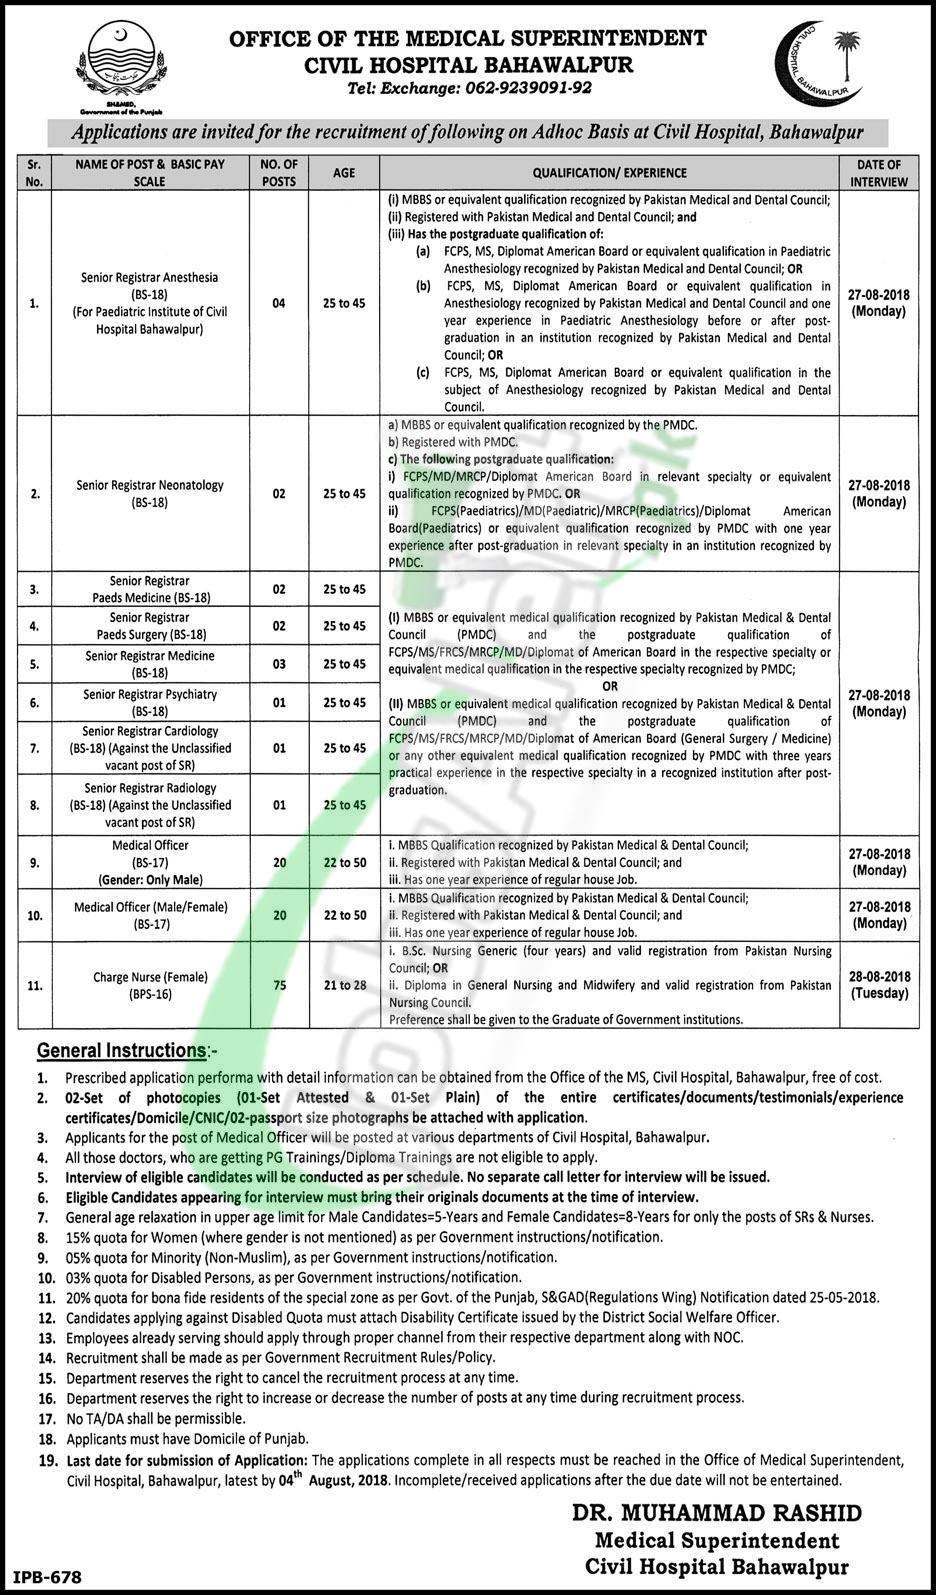 Civil Hospital Bahawalpur Jobs 2018